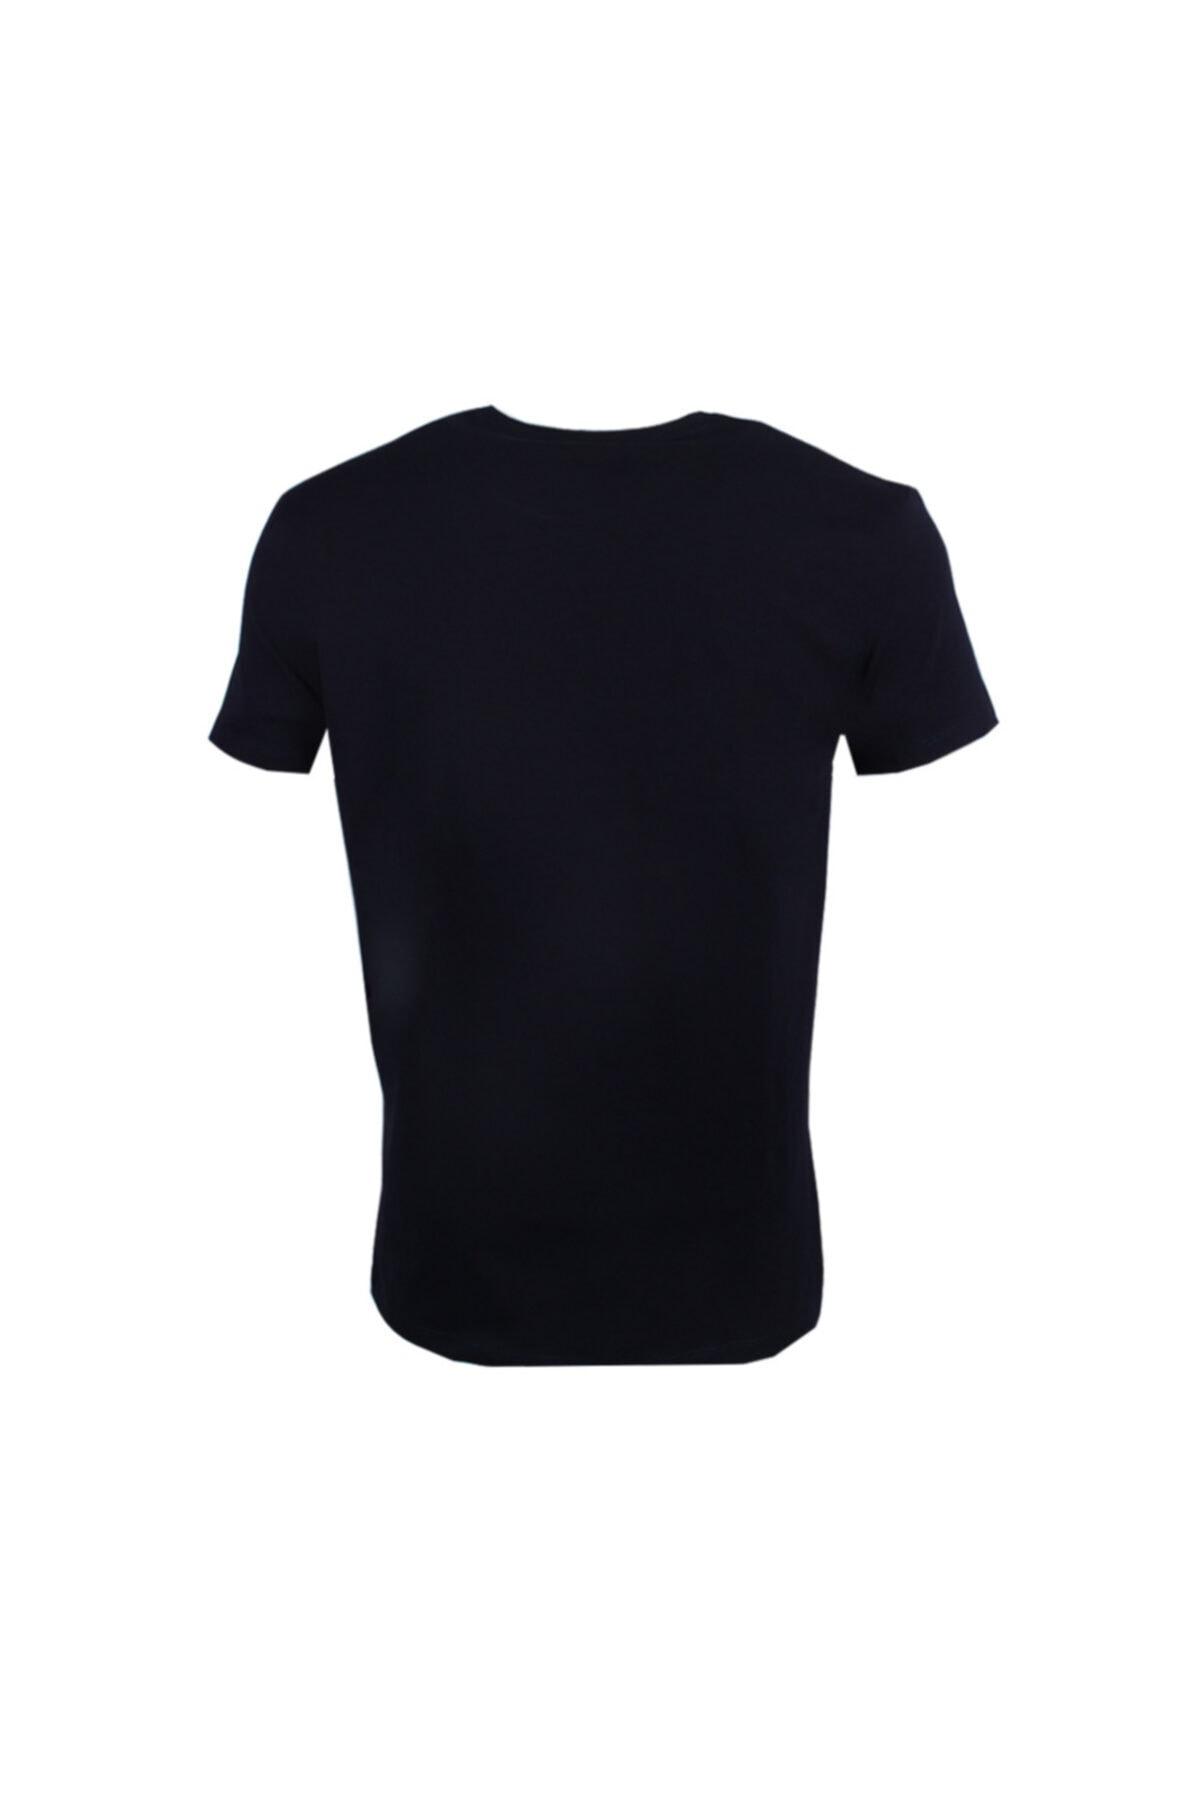 Ottomoda Erkek T-shirt Lacivert 2